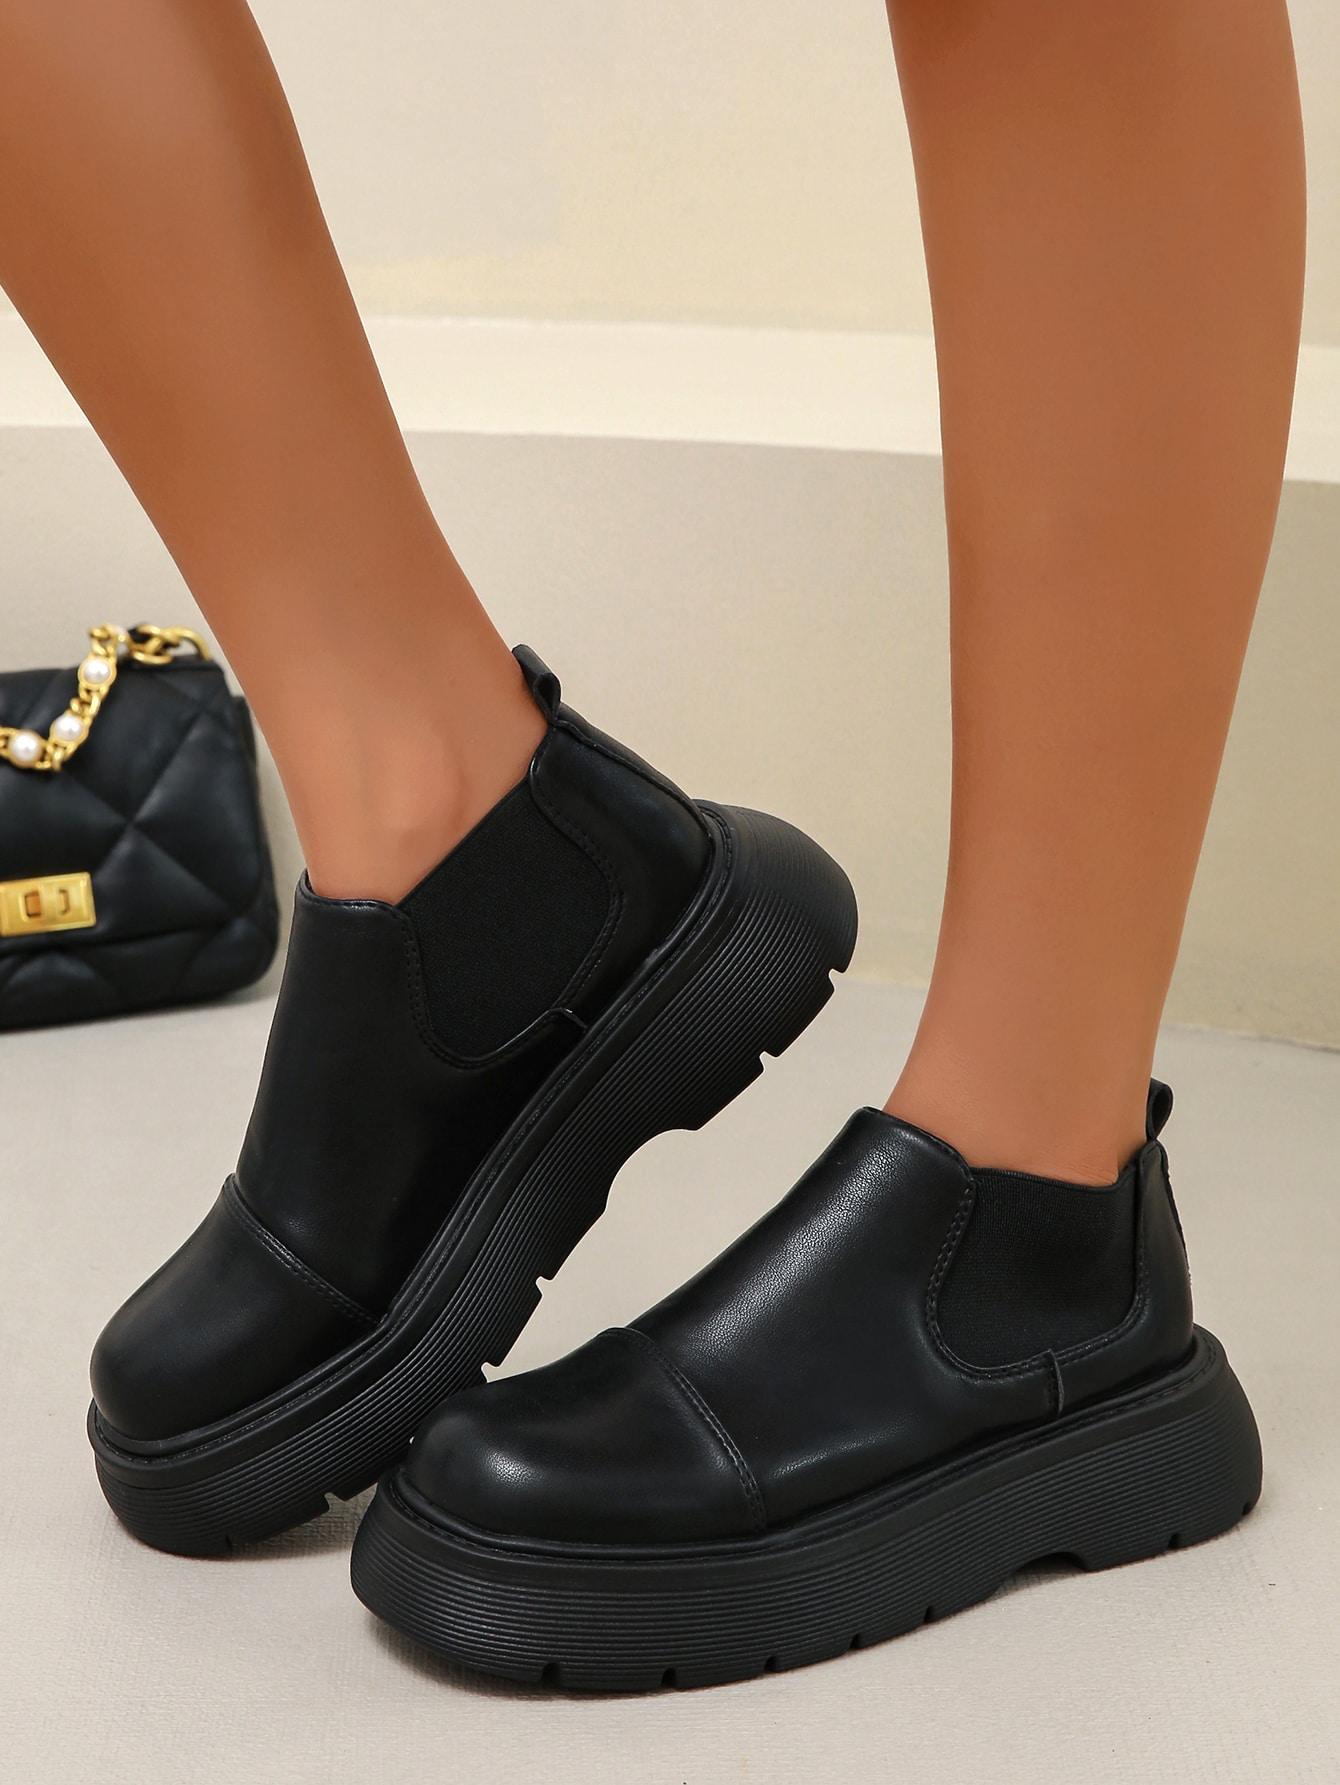 Minimalist Ankle Boots